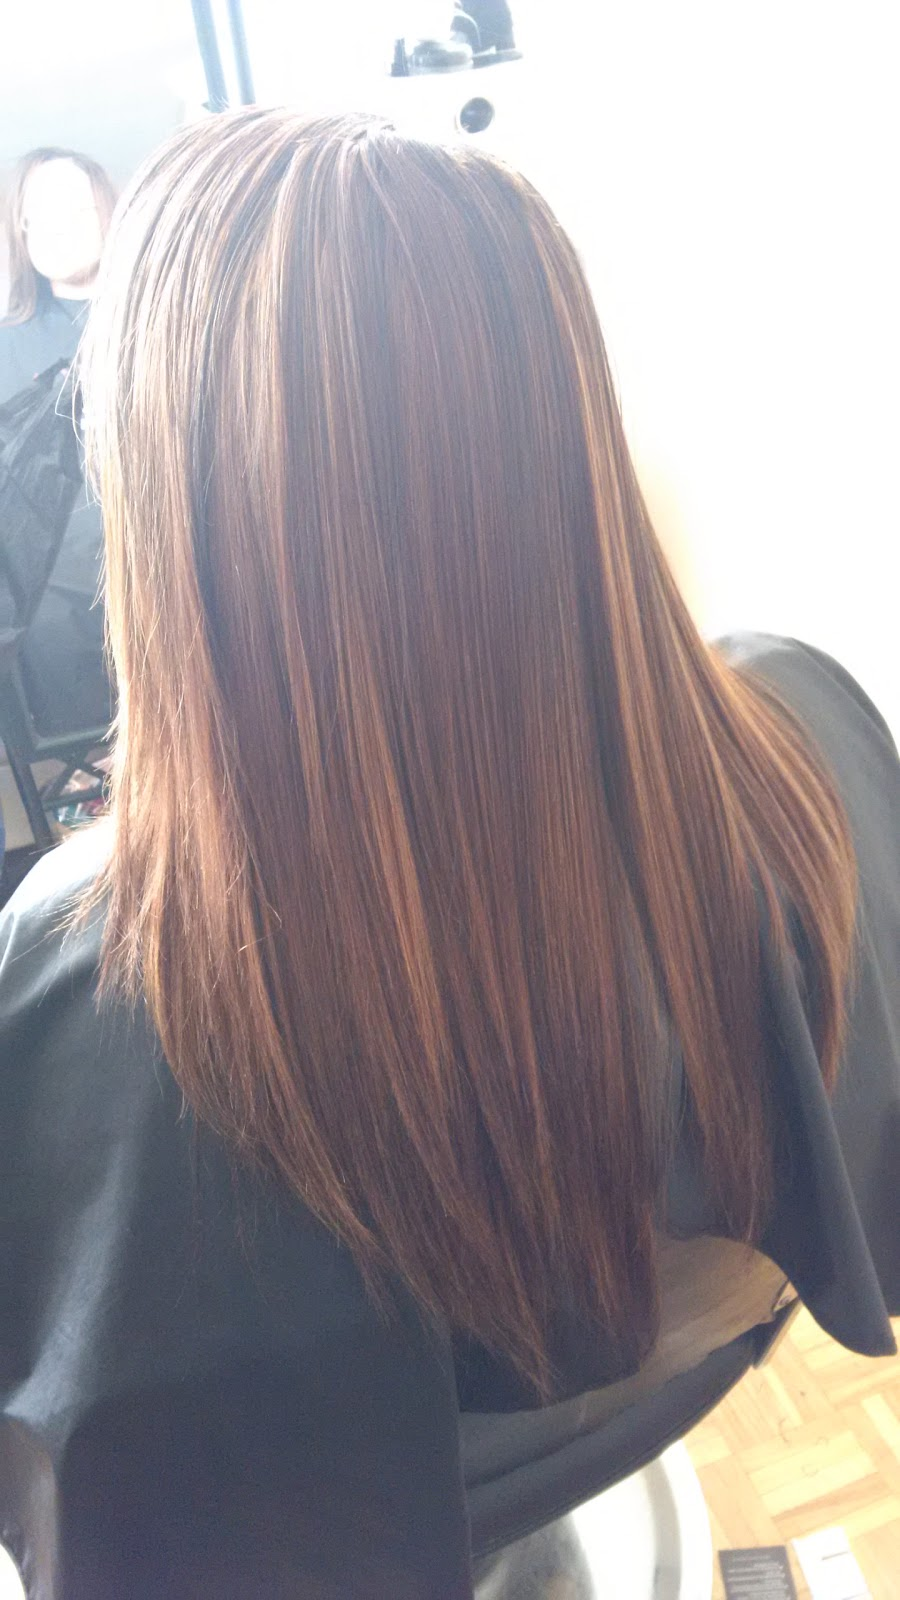 Moore Than Hair   hair care   Eglinton Ave E And, McCowan Rd, Scarborough, ON M1M 2A9, Canada   6475888054 OR +1 647-588-8054